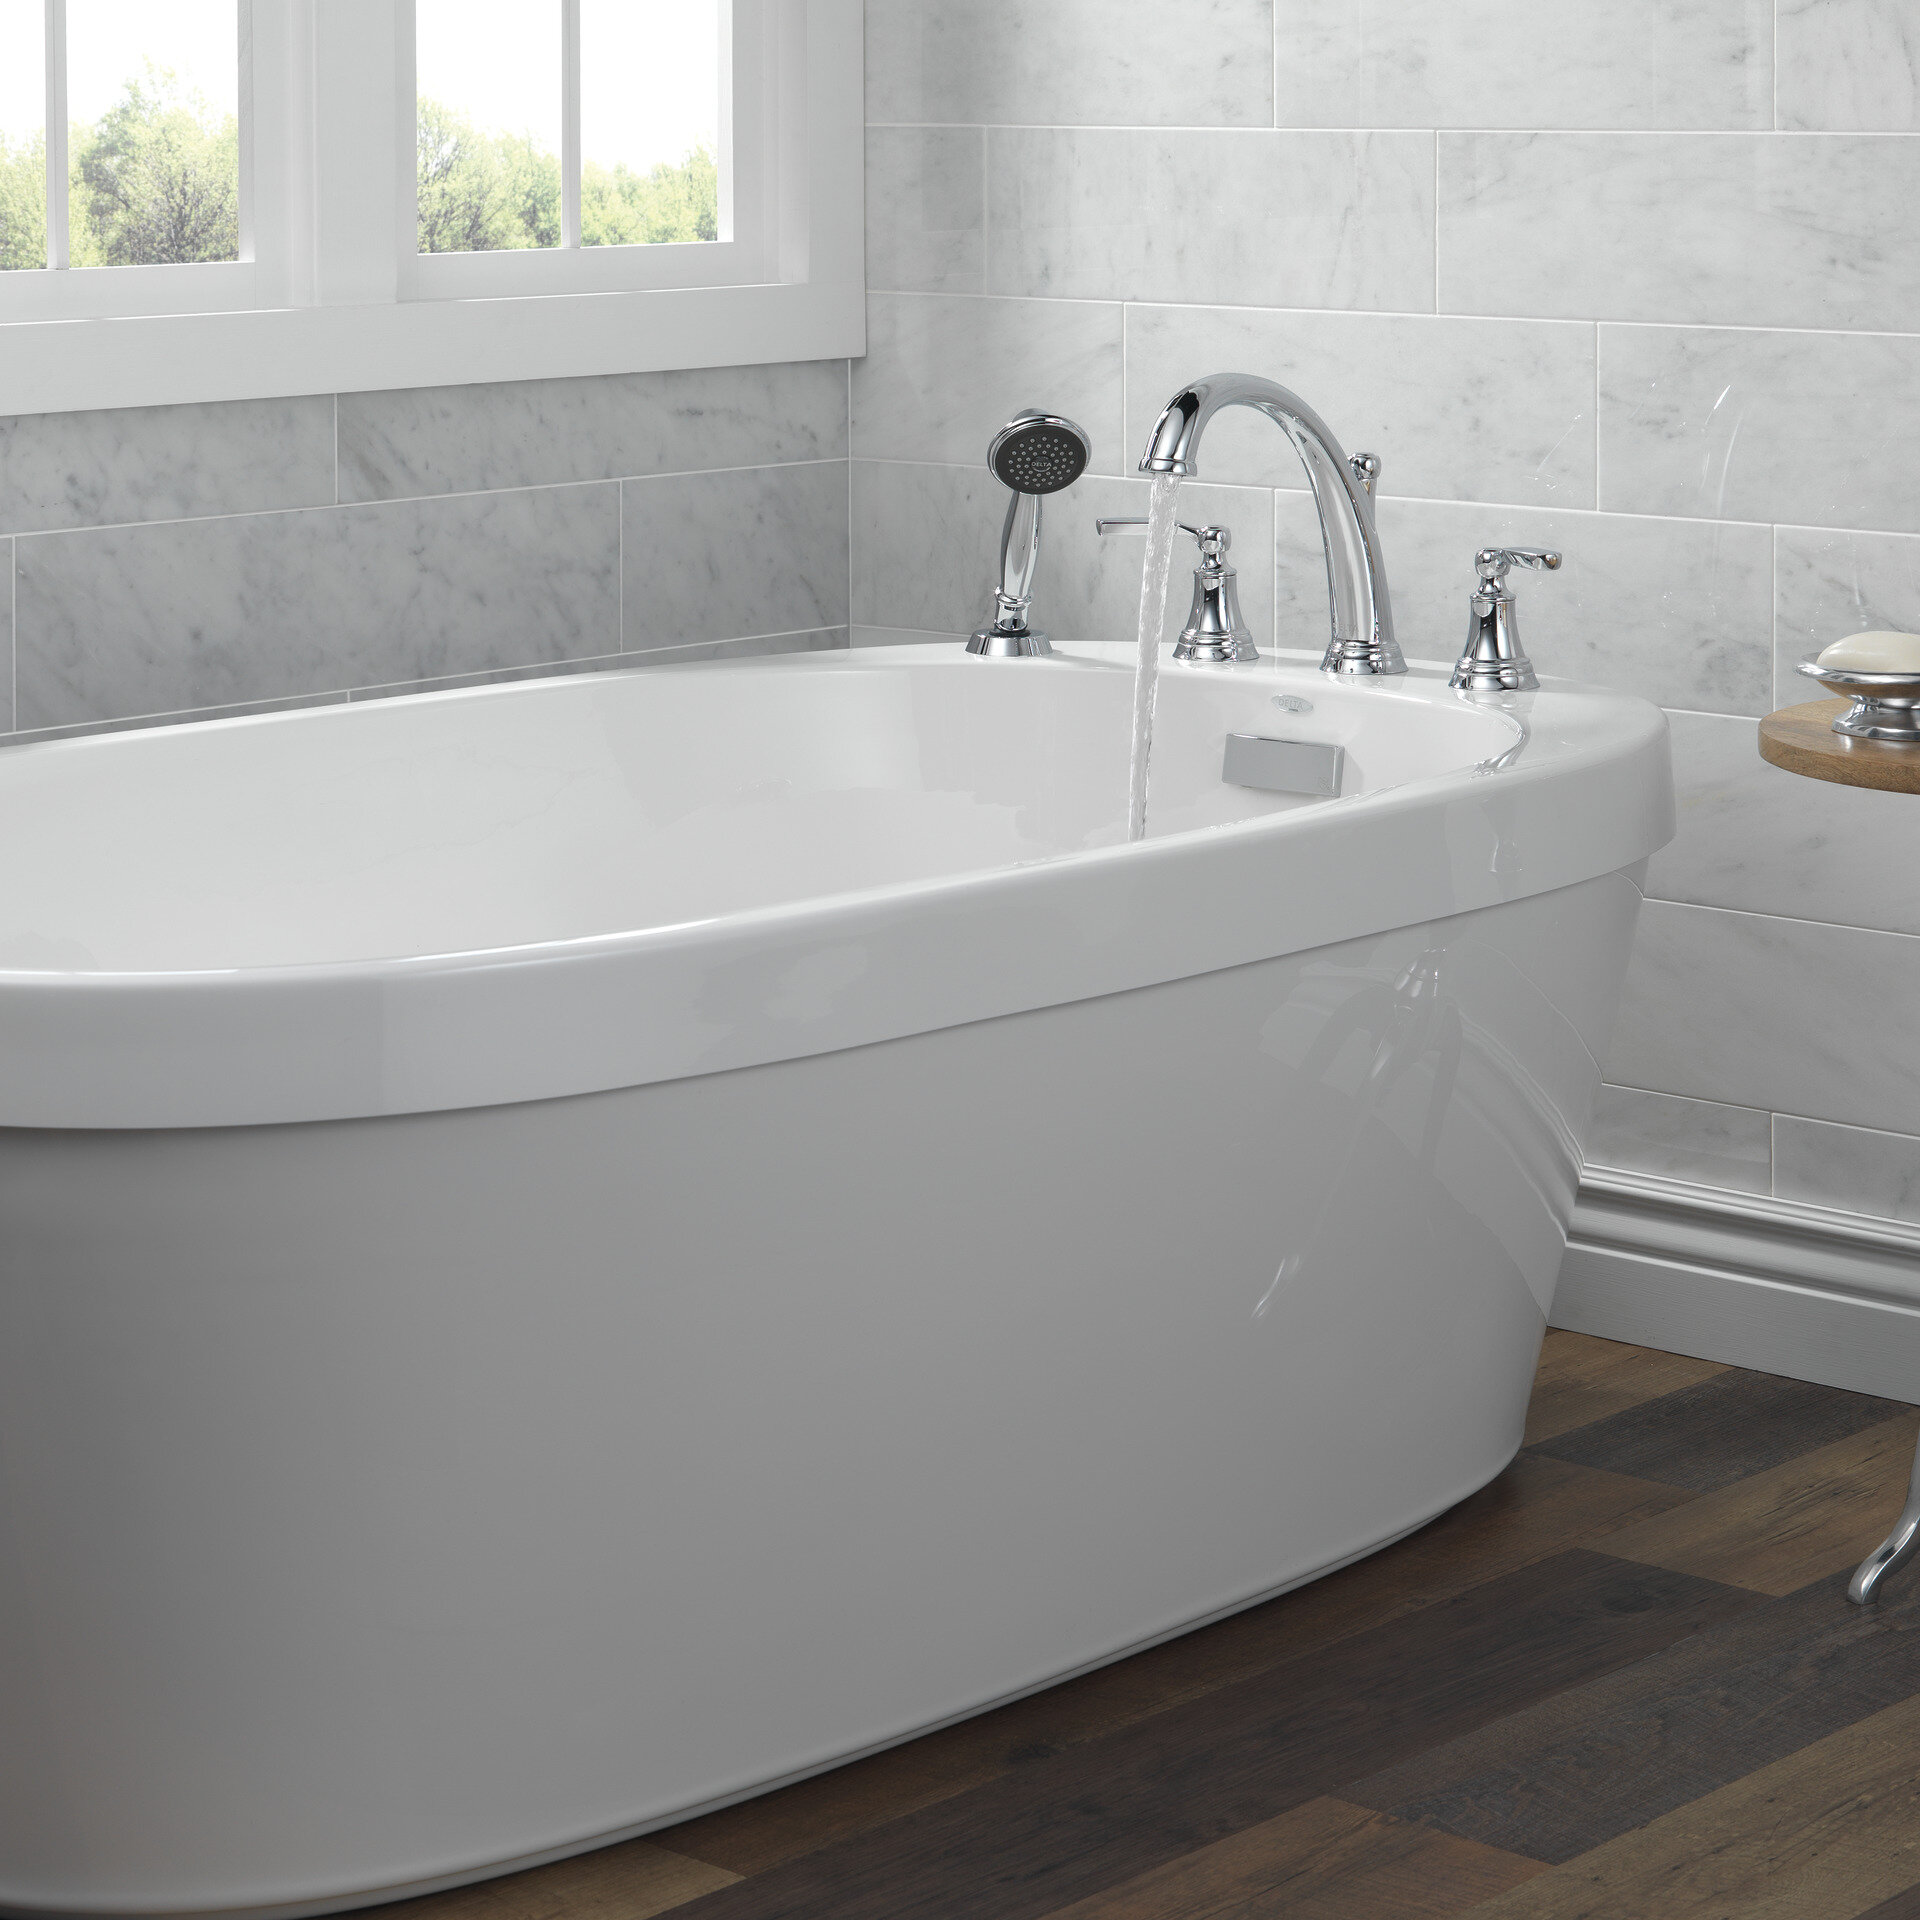 Delta Double Handle Deck Mounted Roman Tub Faucet Trim With Handshower Wayfair